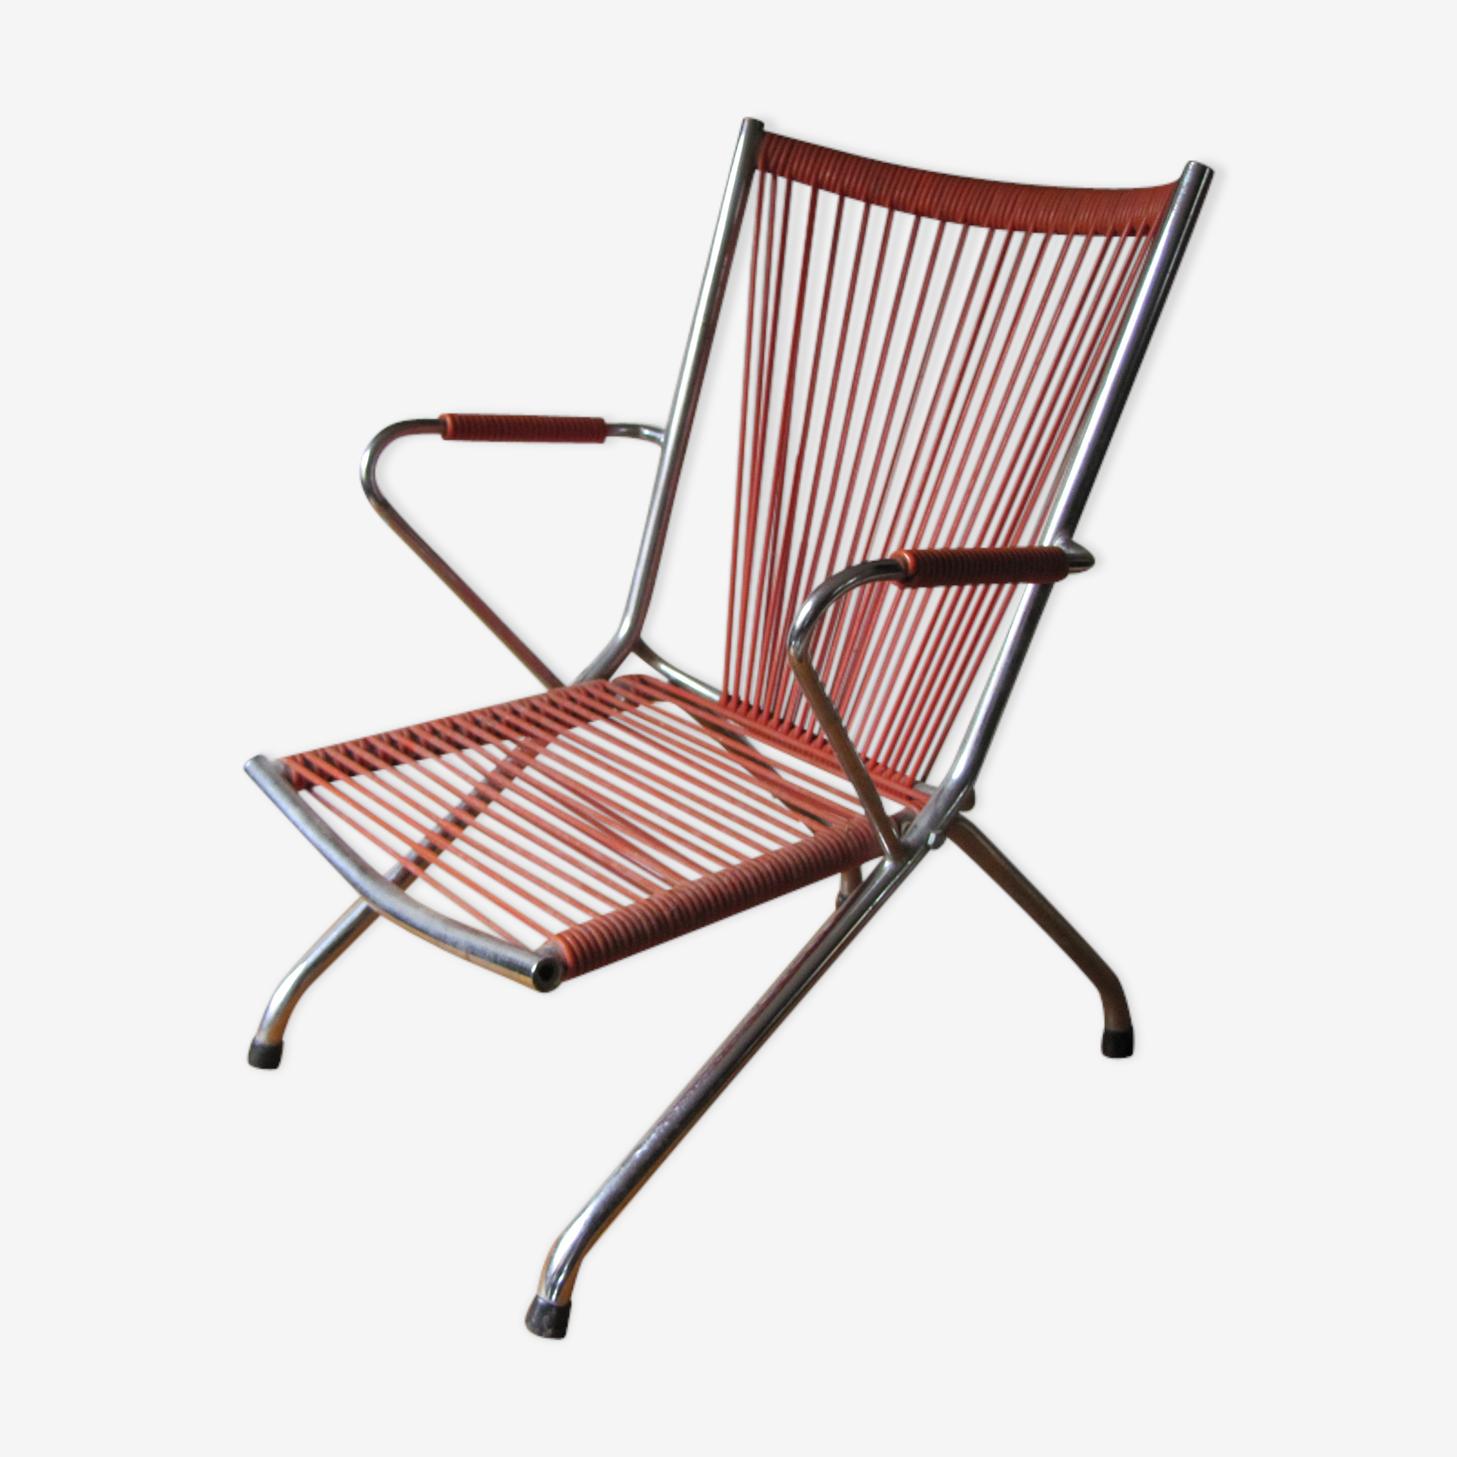 Chair child scoubidou folding vintage 60s